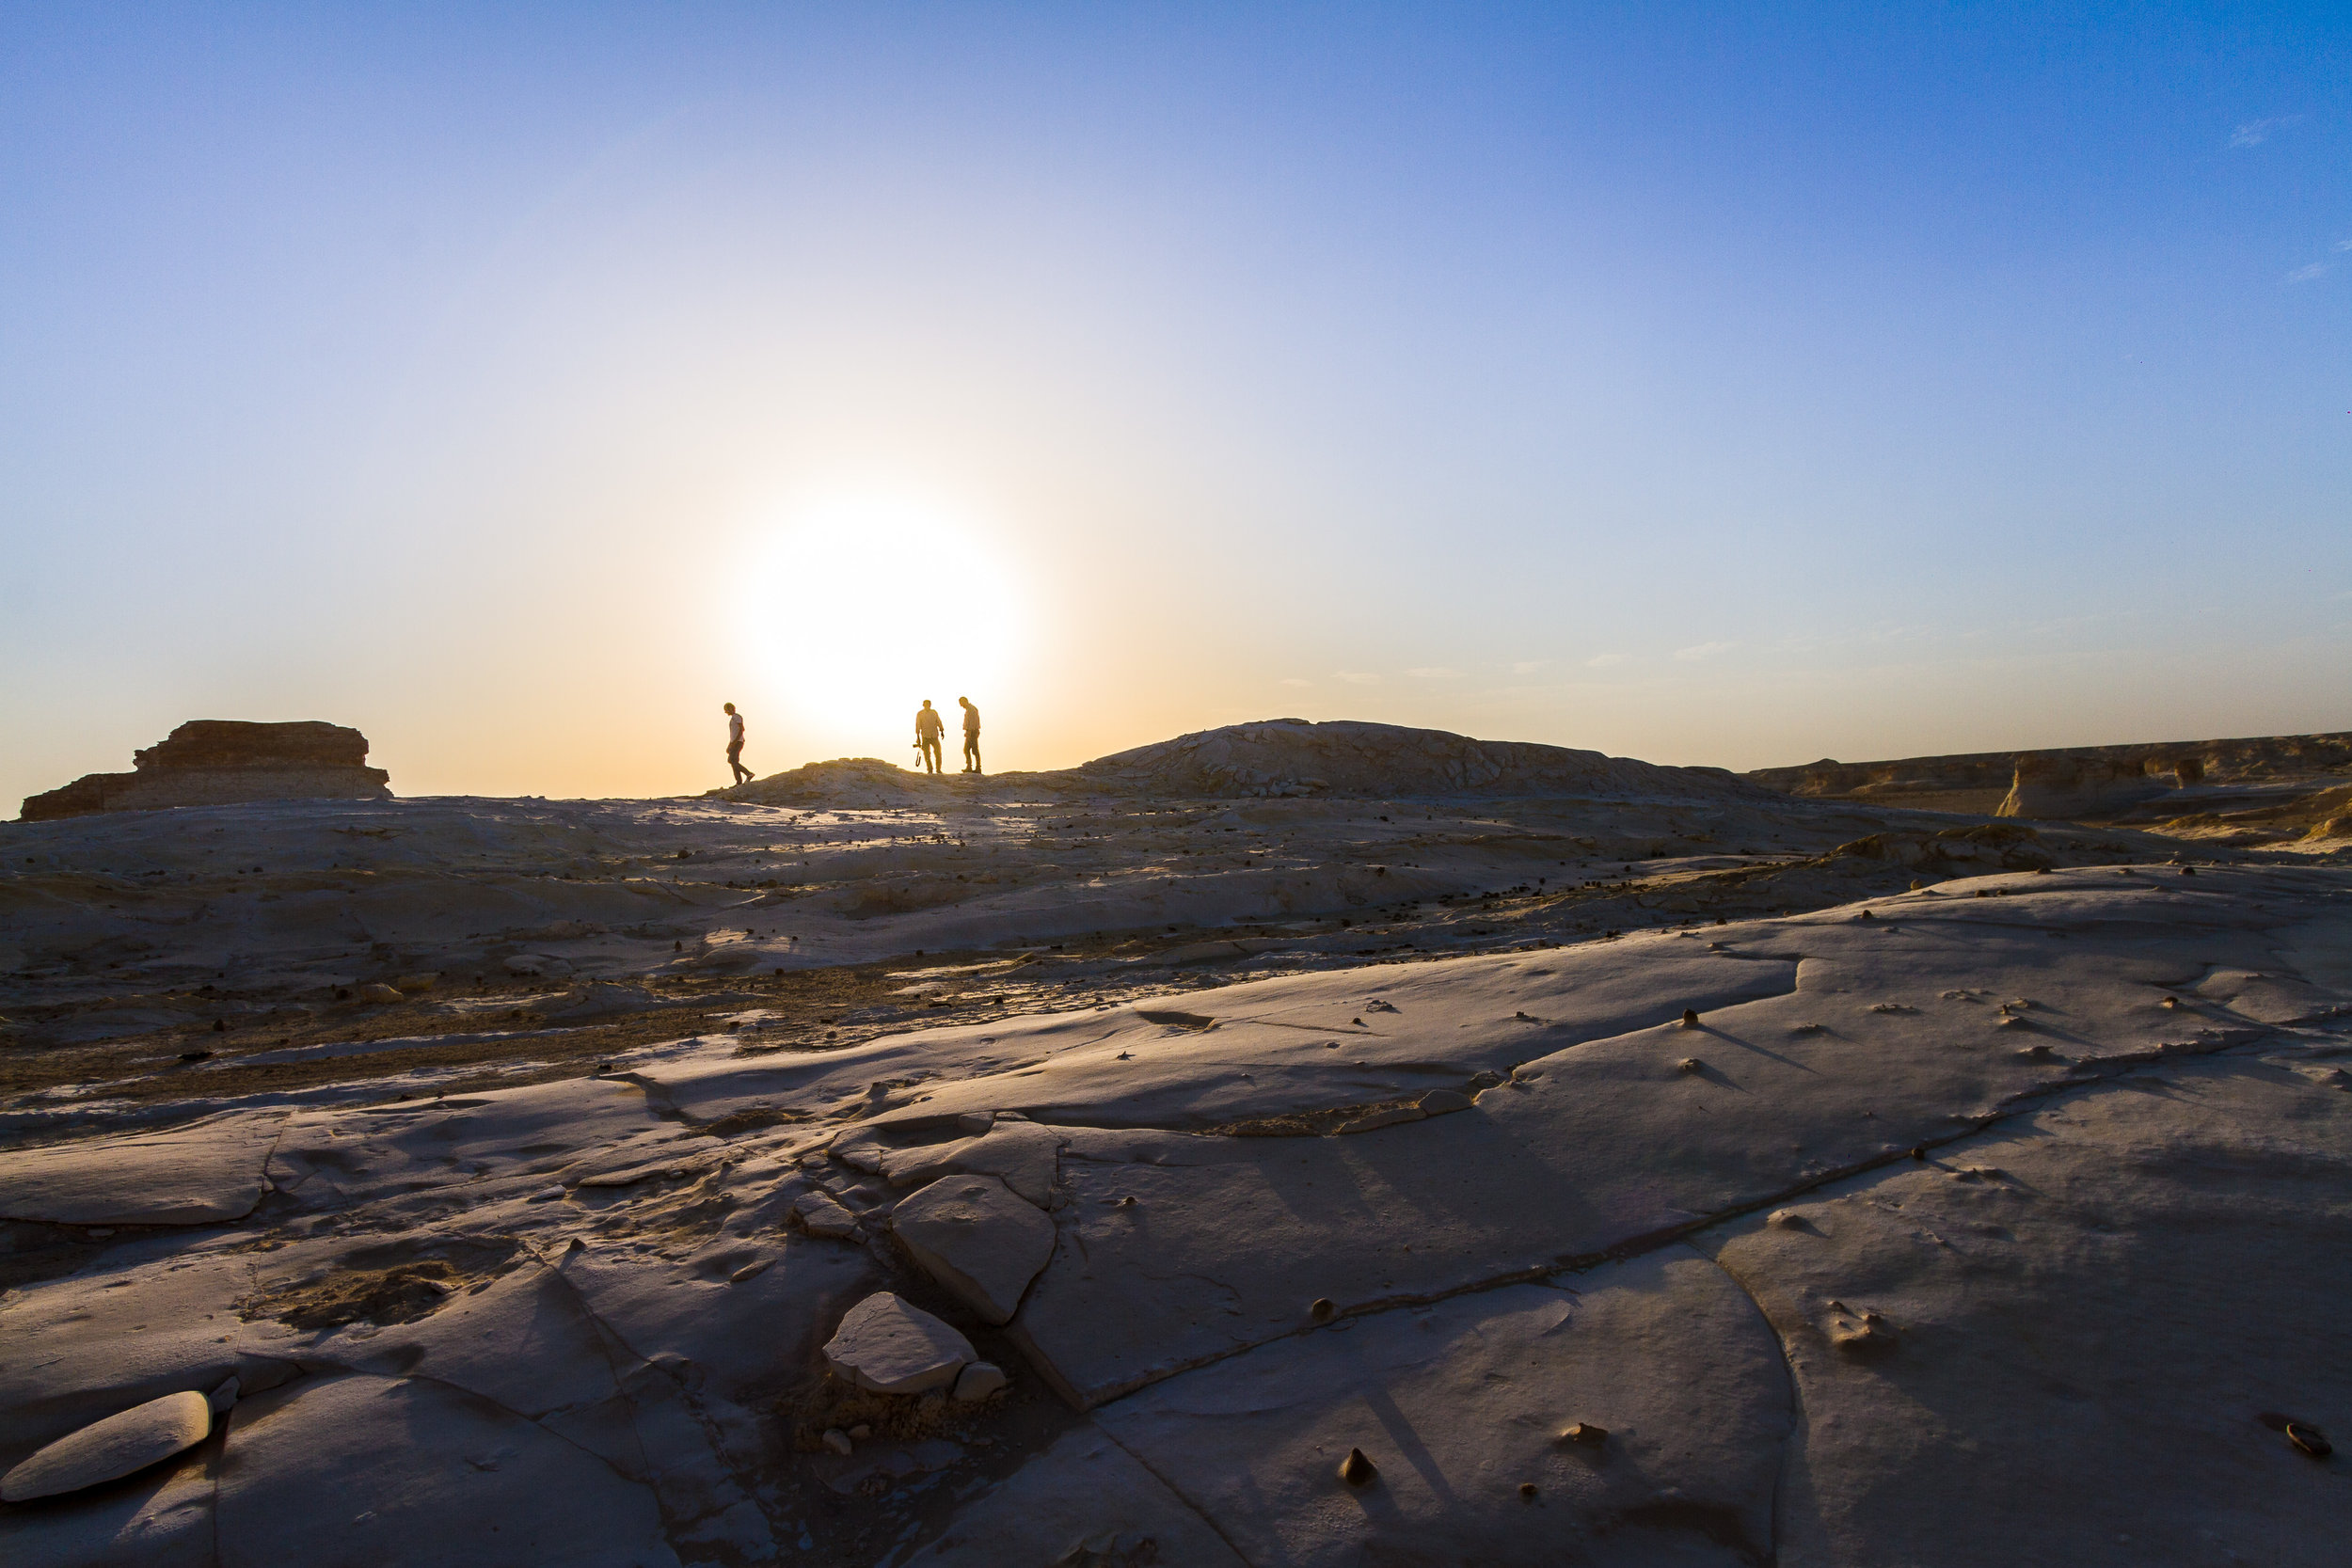 Ali-Barqawi-Studios-Adventure-Travel-Wadi-Dahek-RSCN-JTB-2017